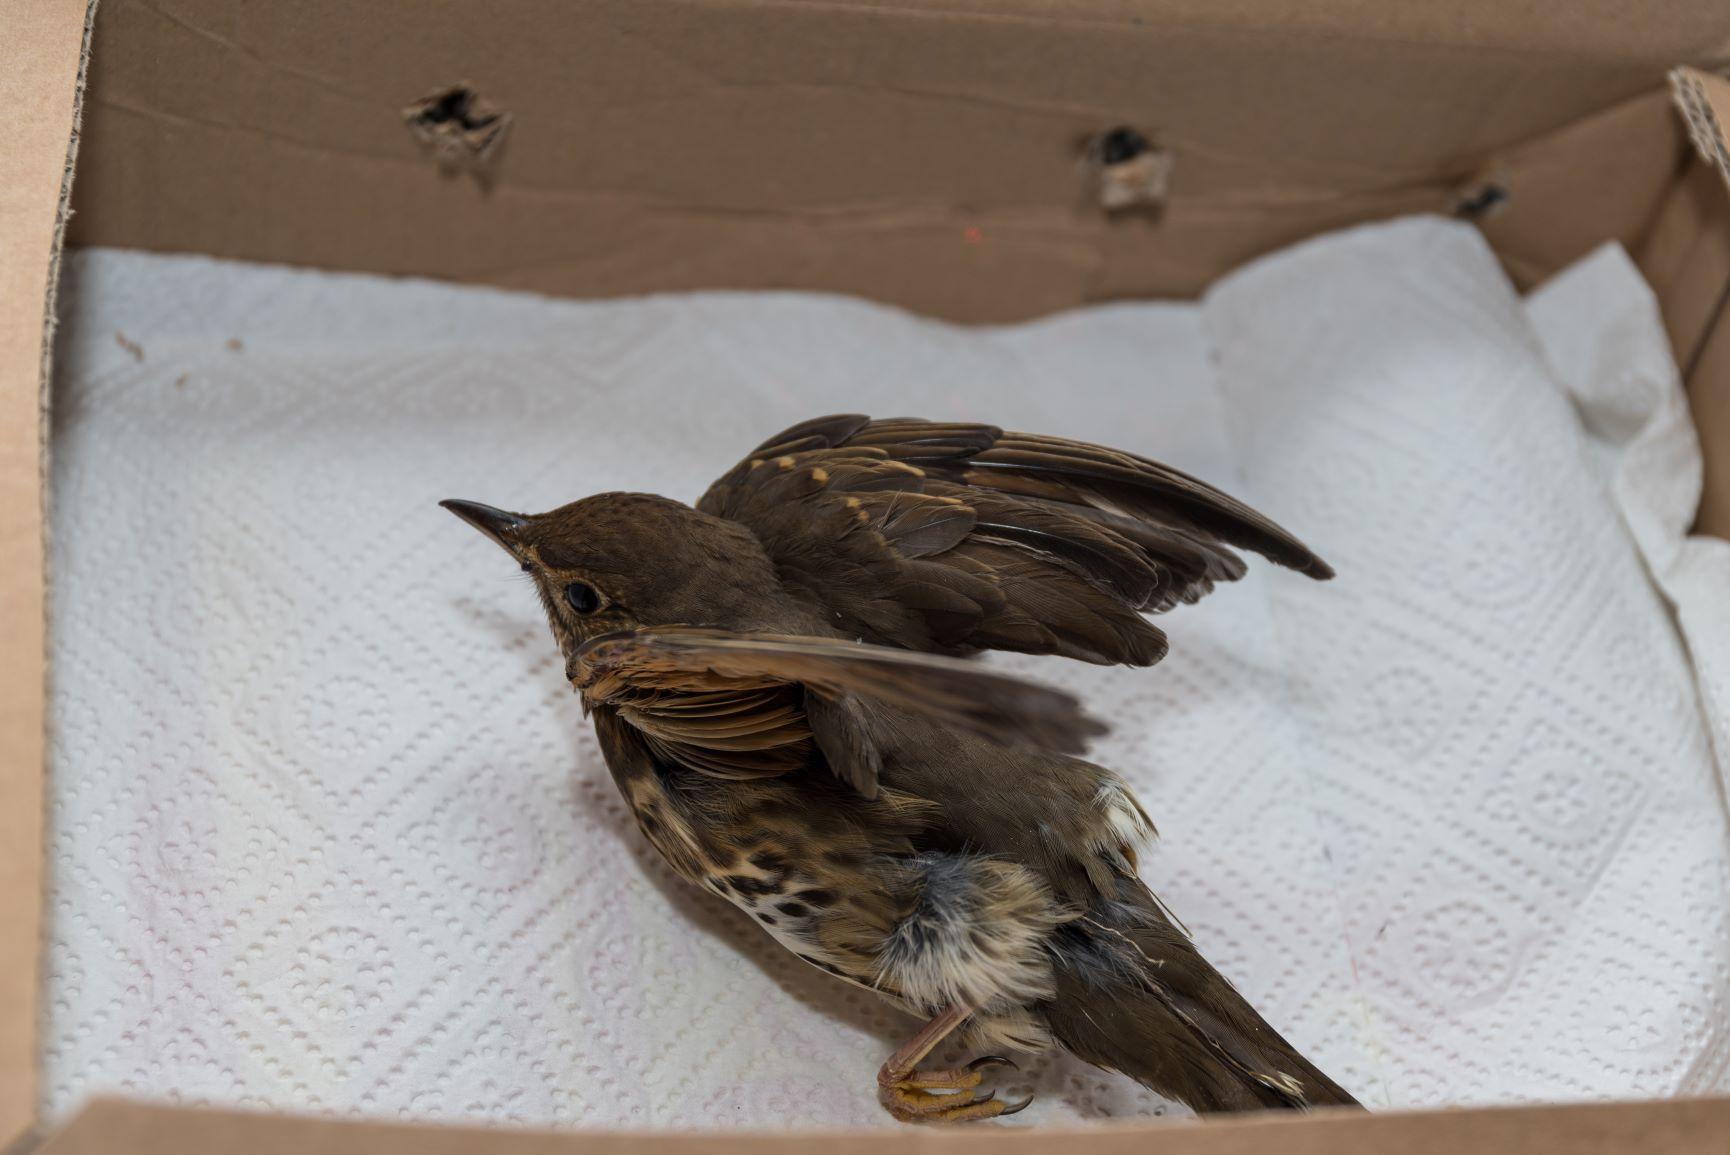 injured wild bird in cardboard box